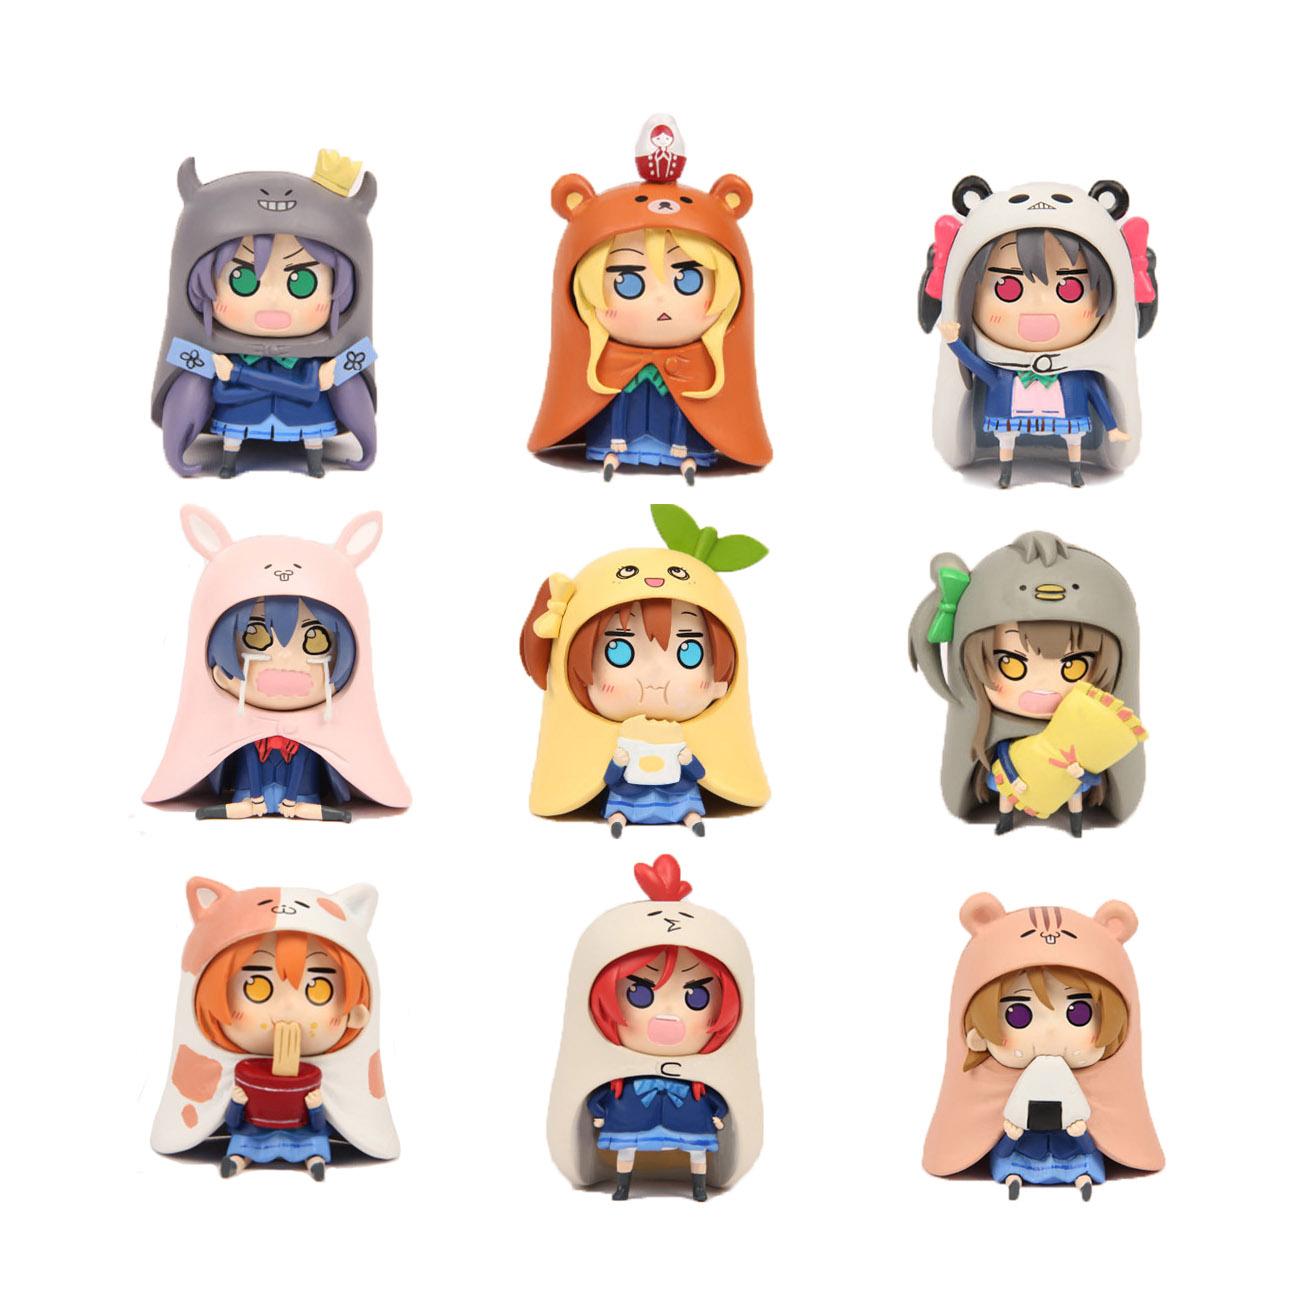 Figurine clipart organik Jepang Gambar Beli Doma Umaru